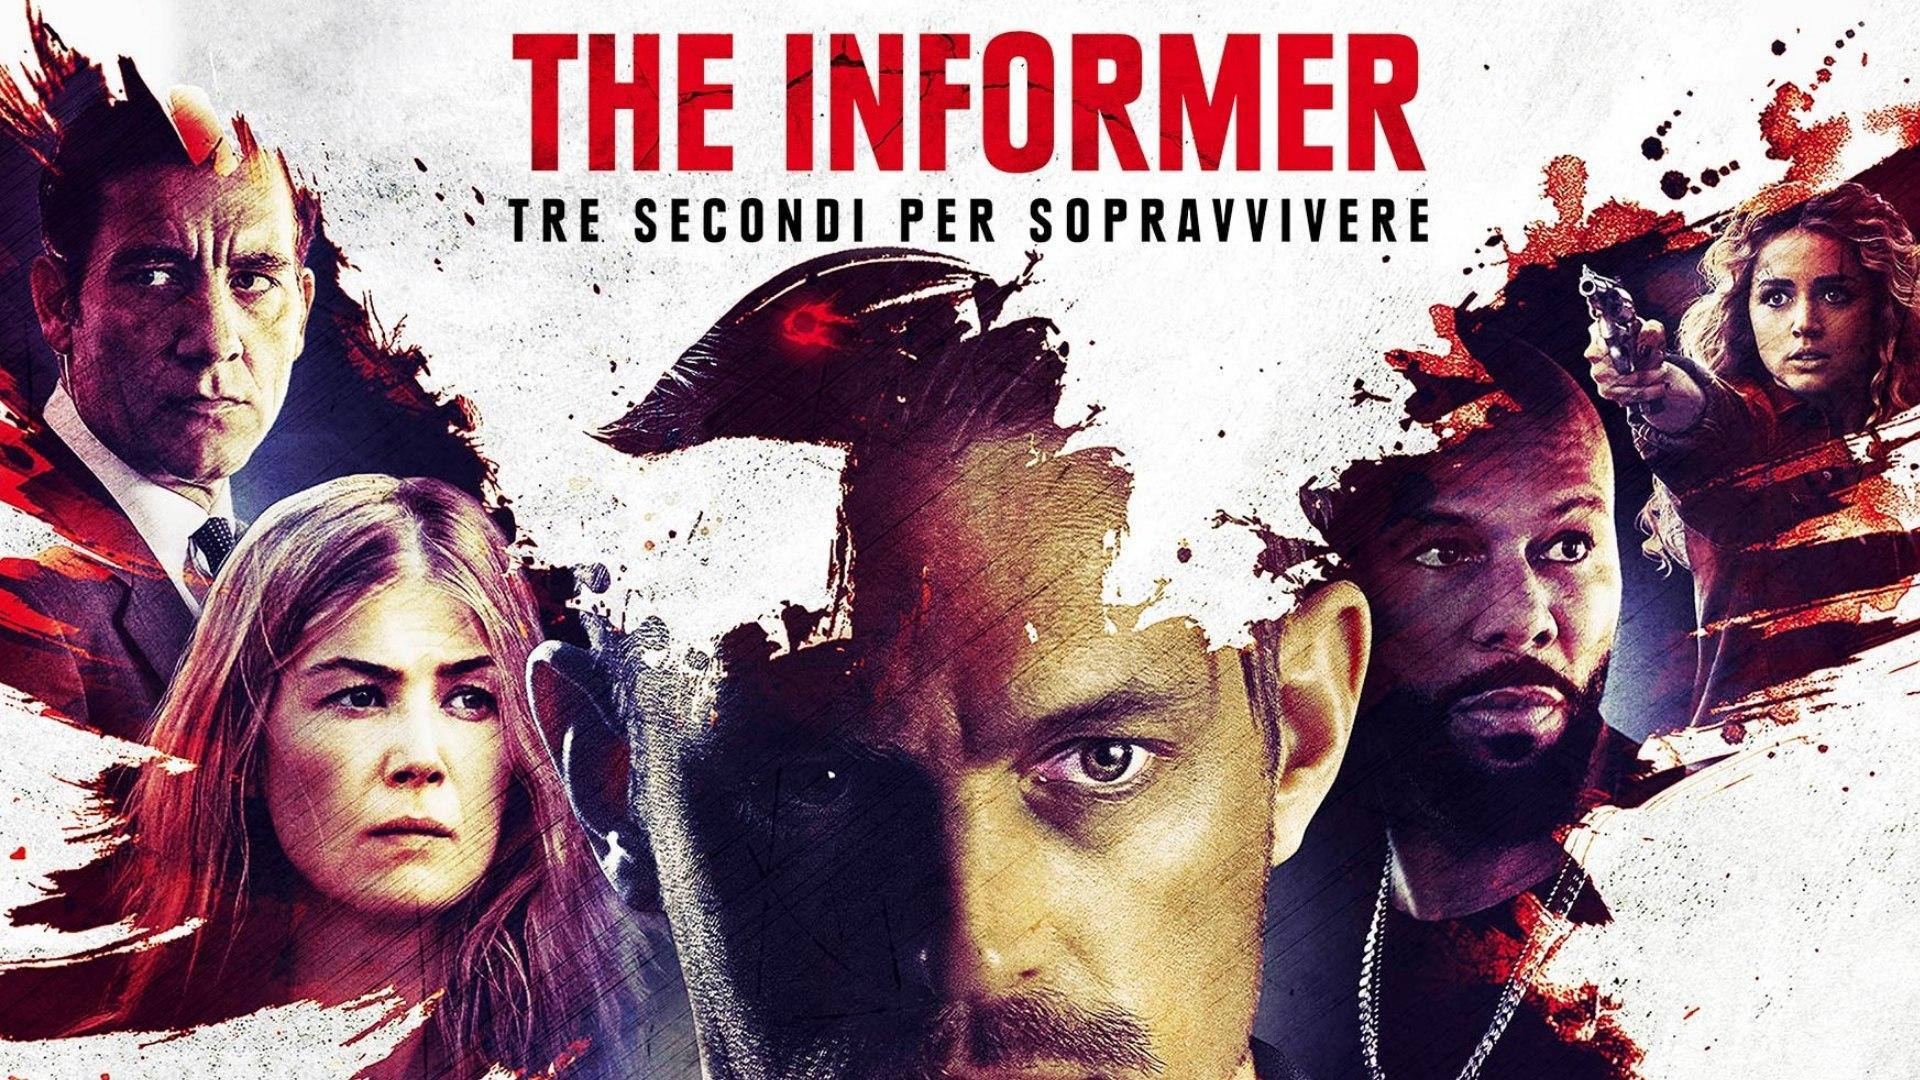 Venerdi 18 Settembre 2020 Sky Cinema HD, The Informer